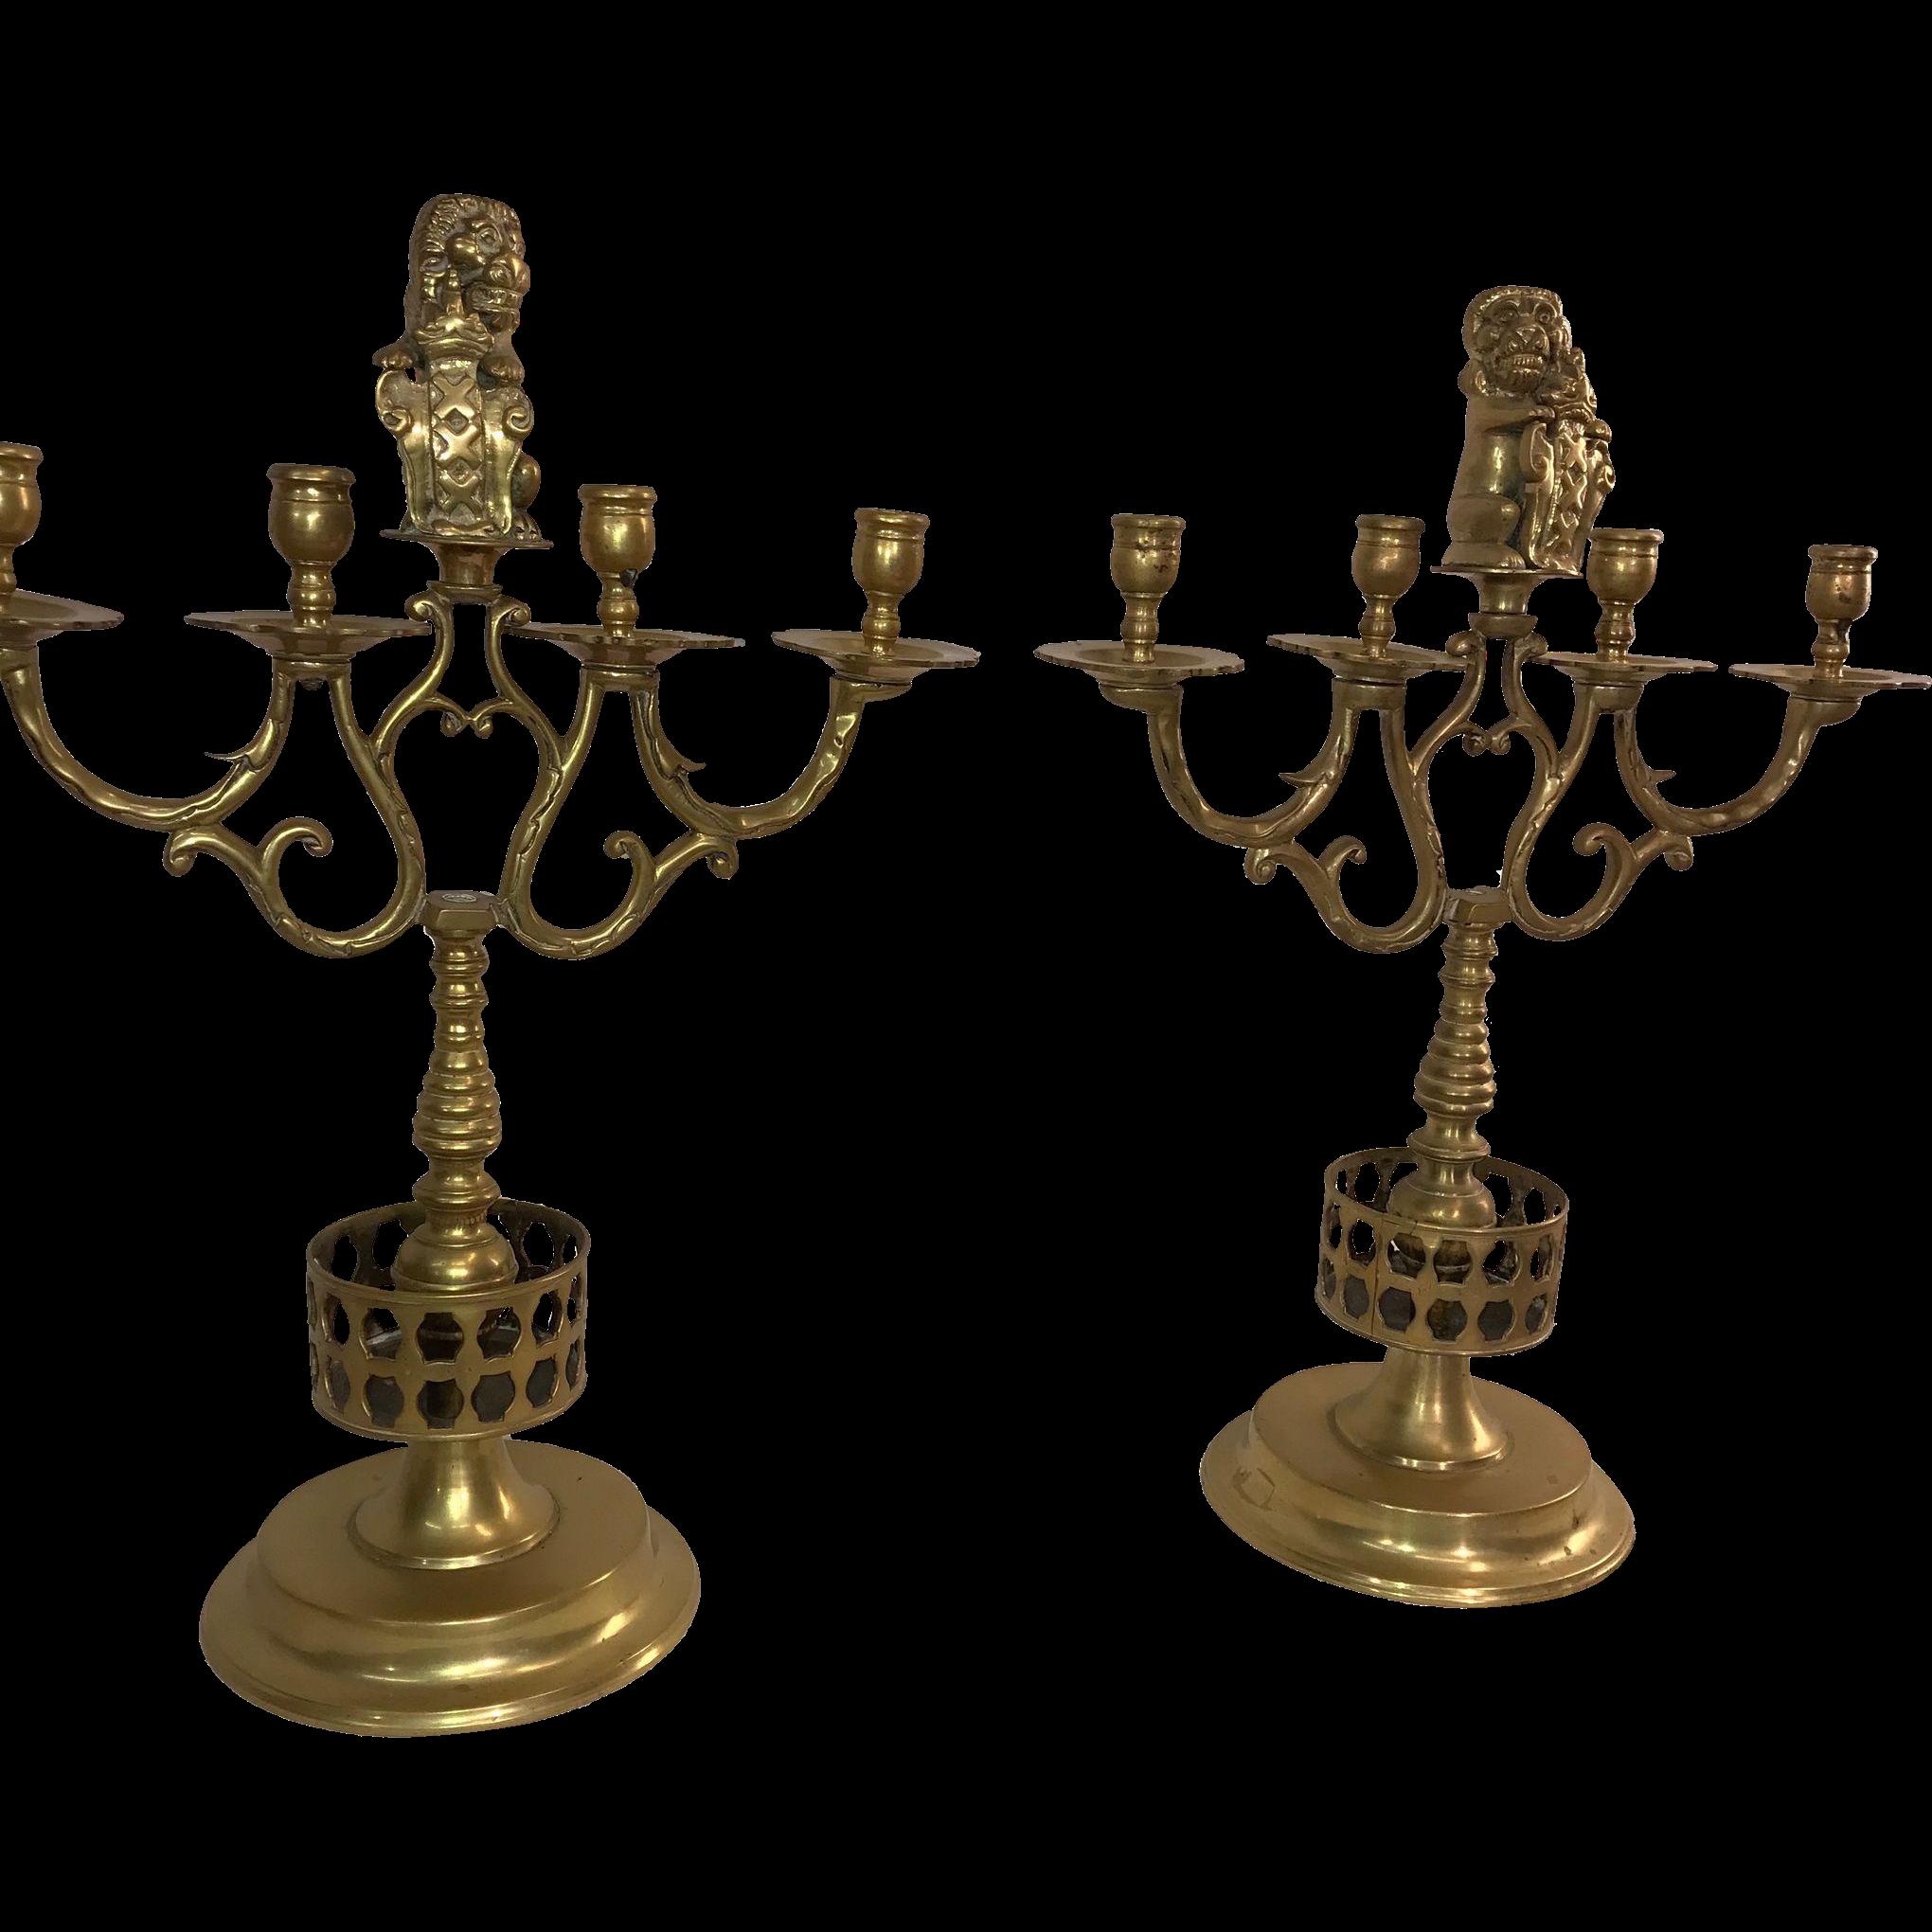 Pair of Bronze Lion Figure Four-Arm Candelabra